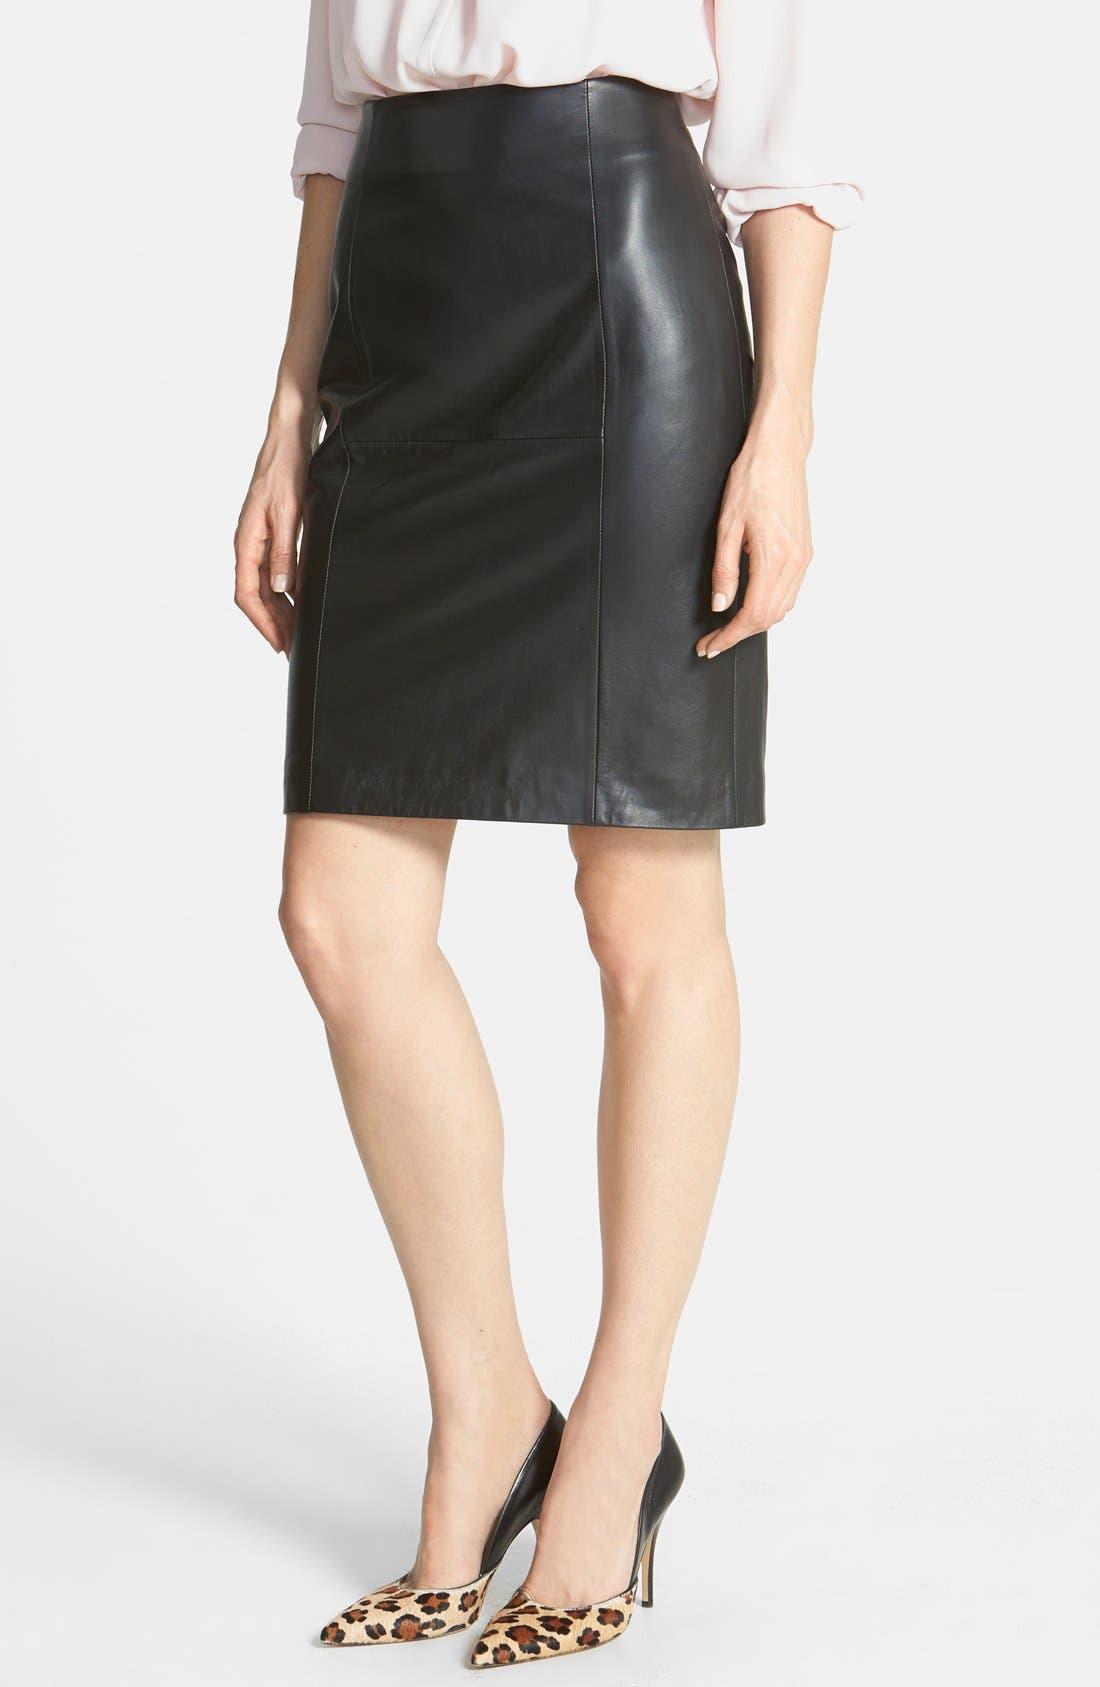 Alternate Image 1 Selected - Halogen® Leather Panel Pencil Skirt (Online Only)